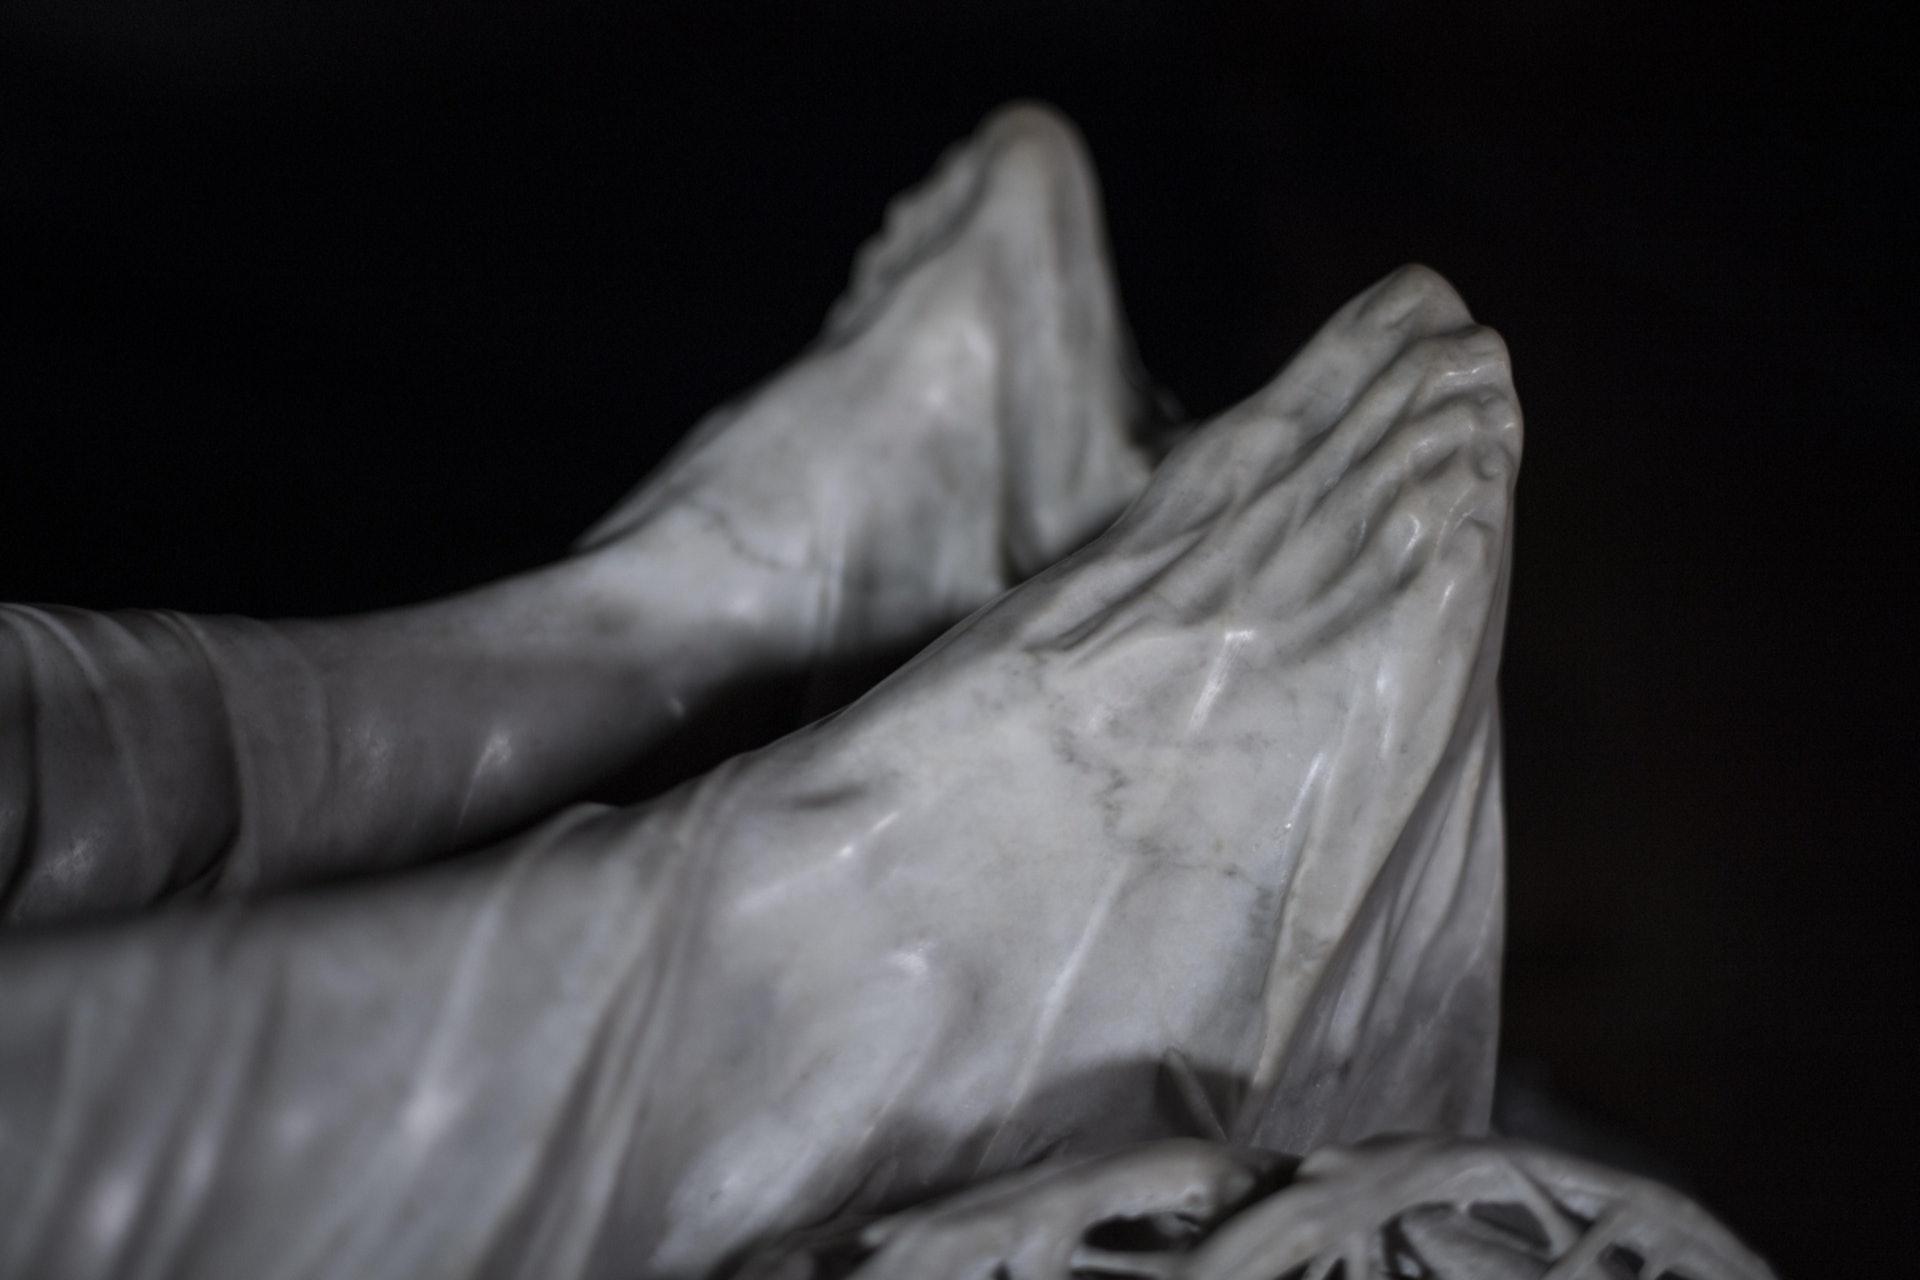 Giuseppe Sanmartino 於1753年創作的《裹屍布下的基督》(又稱蒙面的基督)。(圖片擷取自︰www.museosansevero.it)